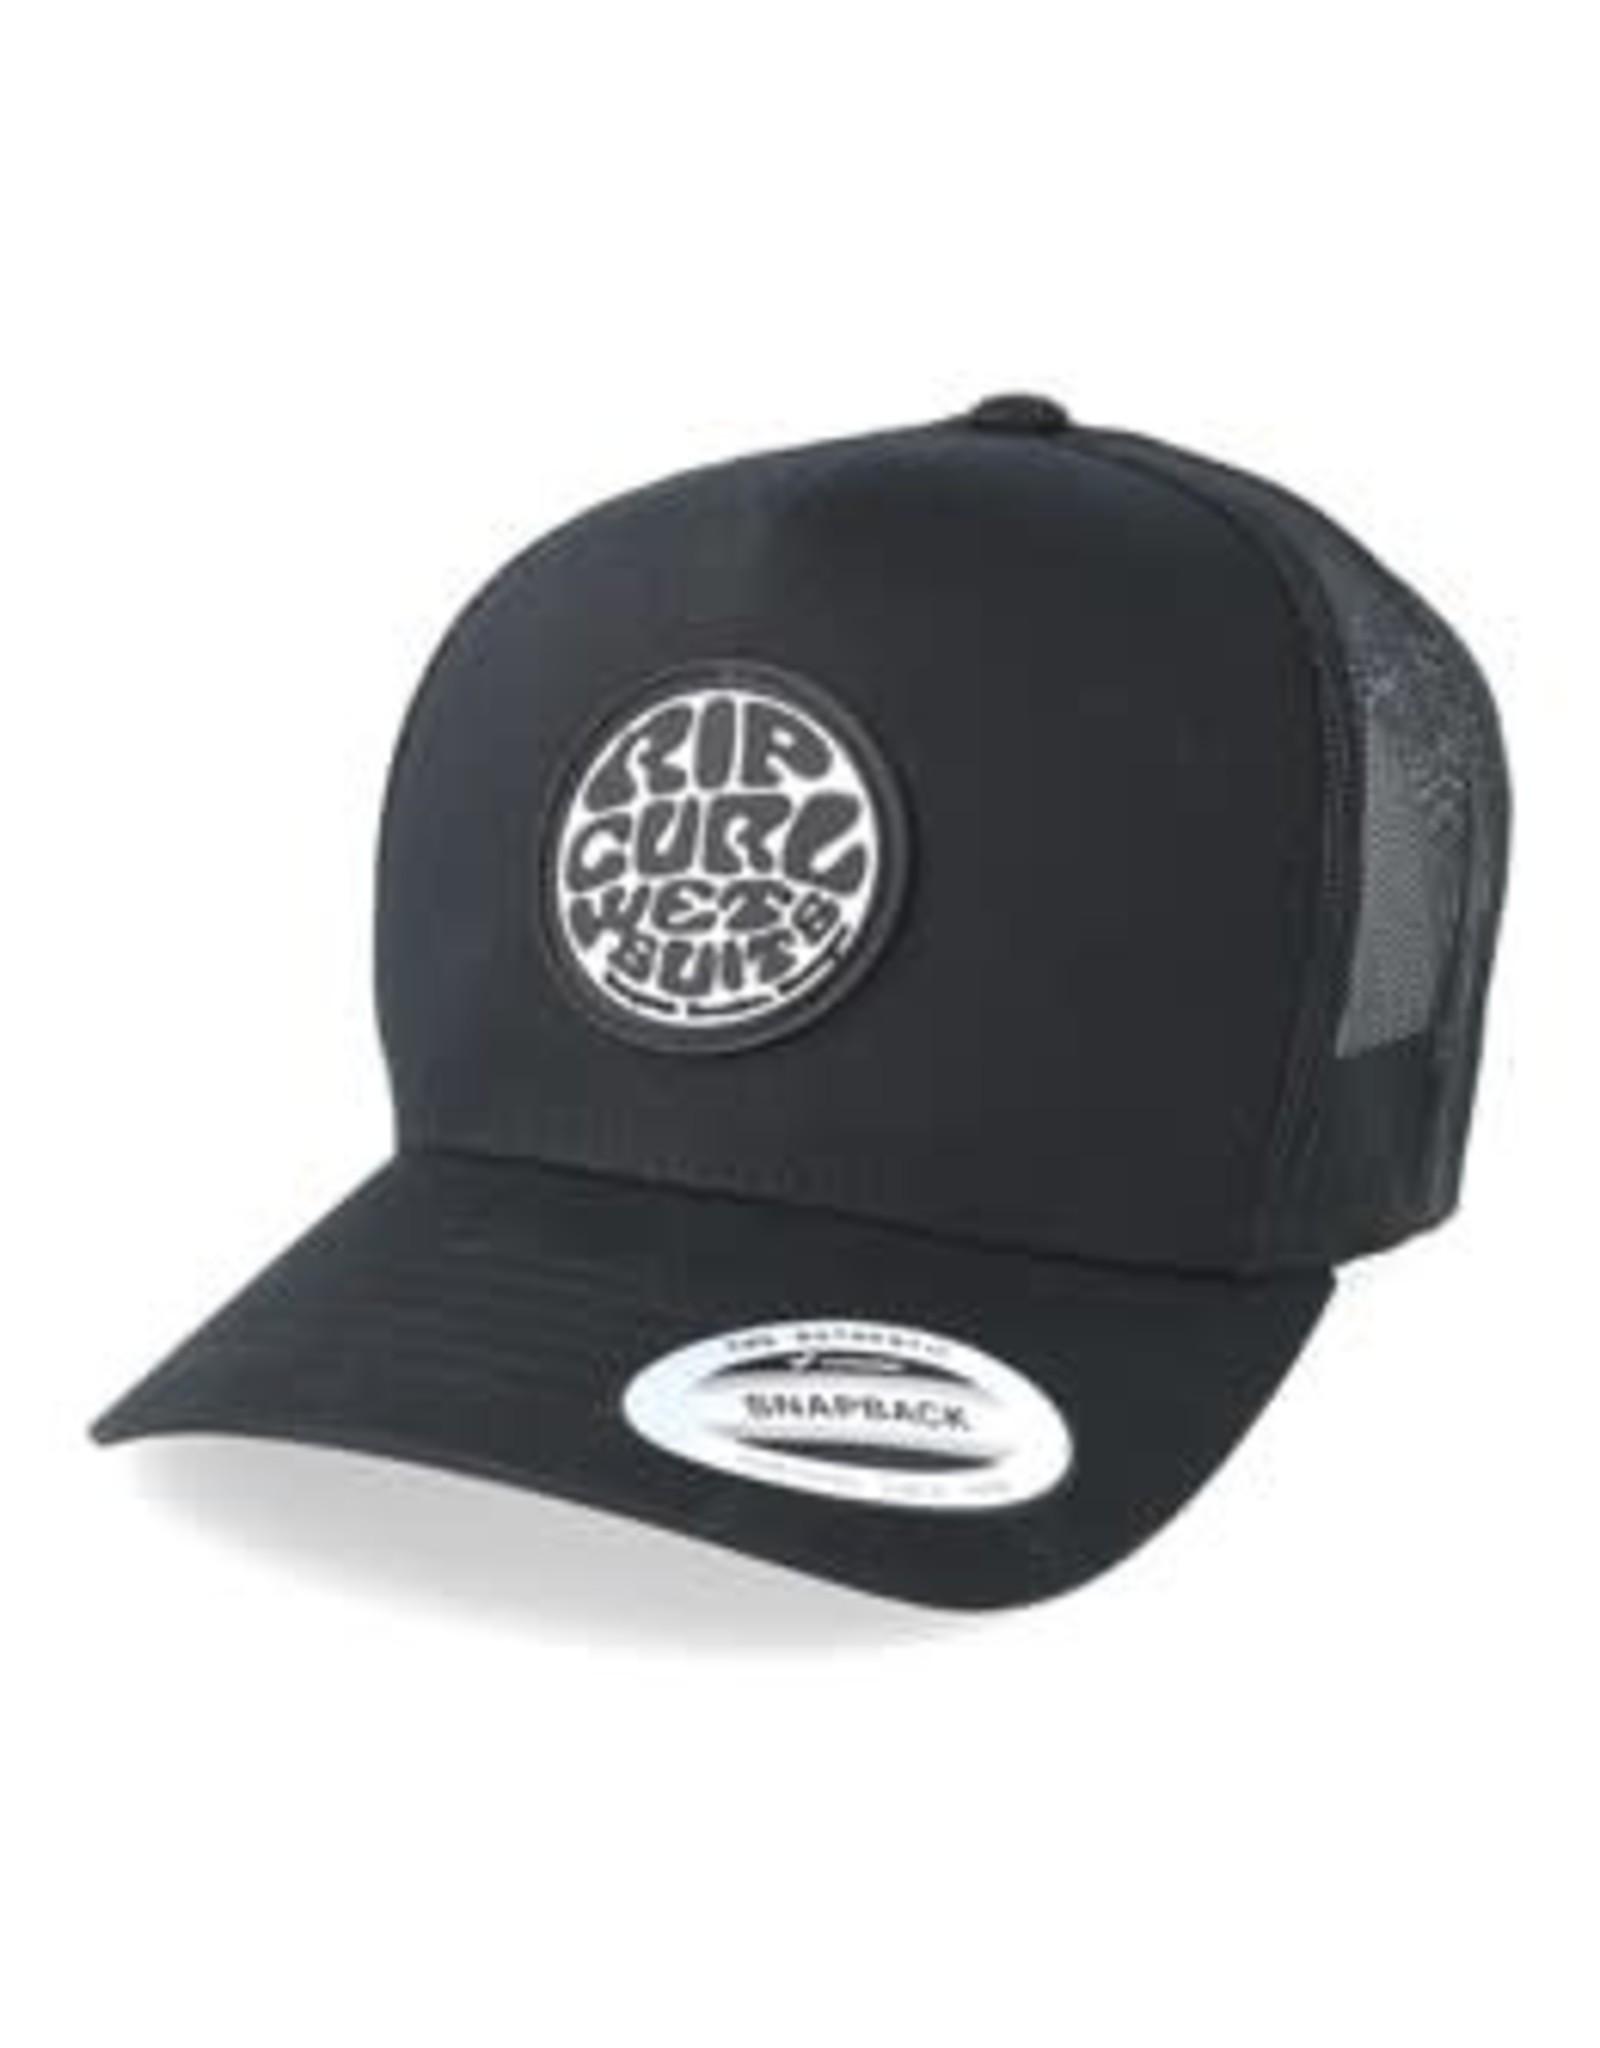 Rip Curl Rip Curl Icons Trucker Black